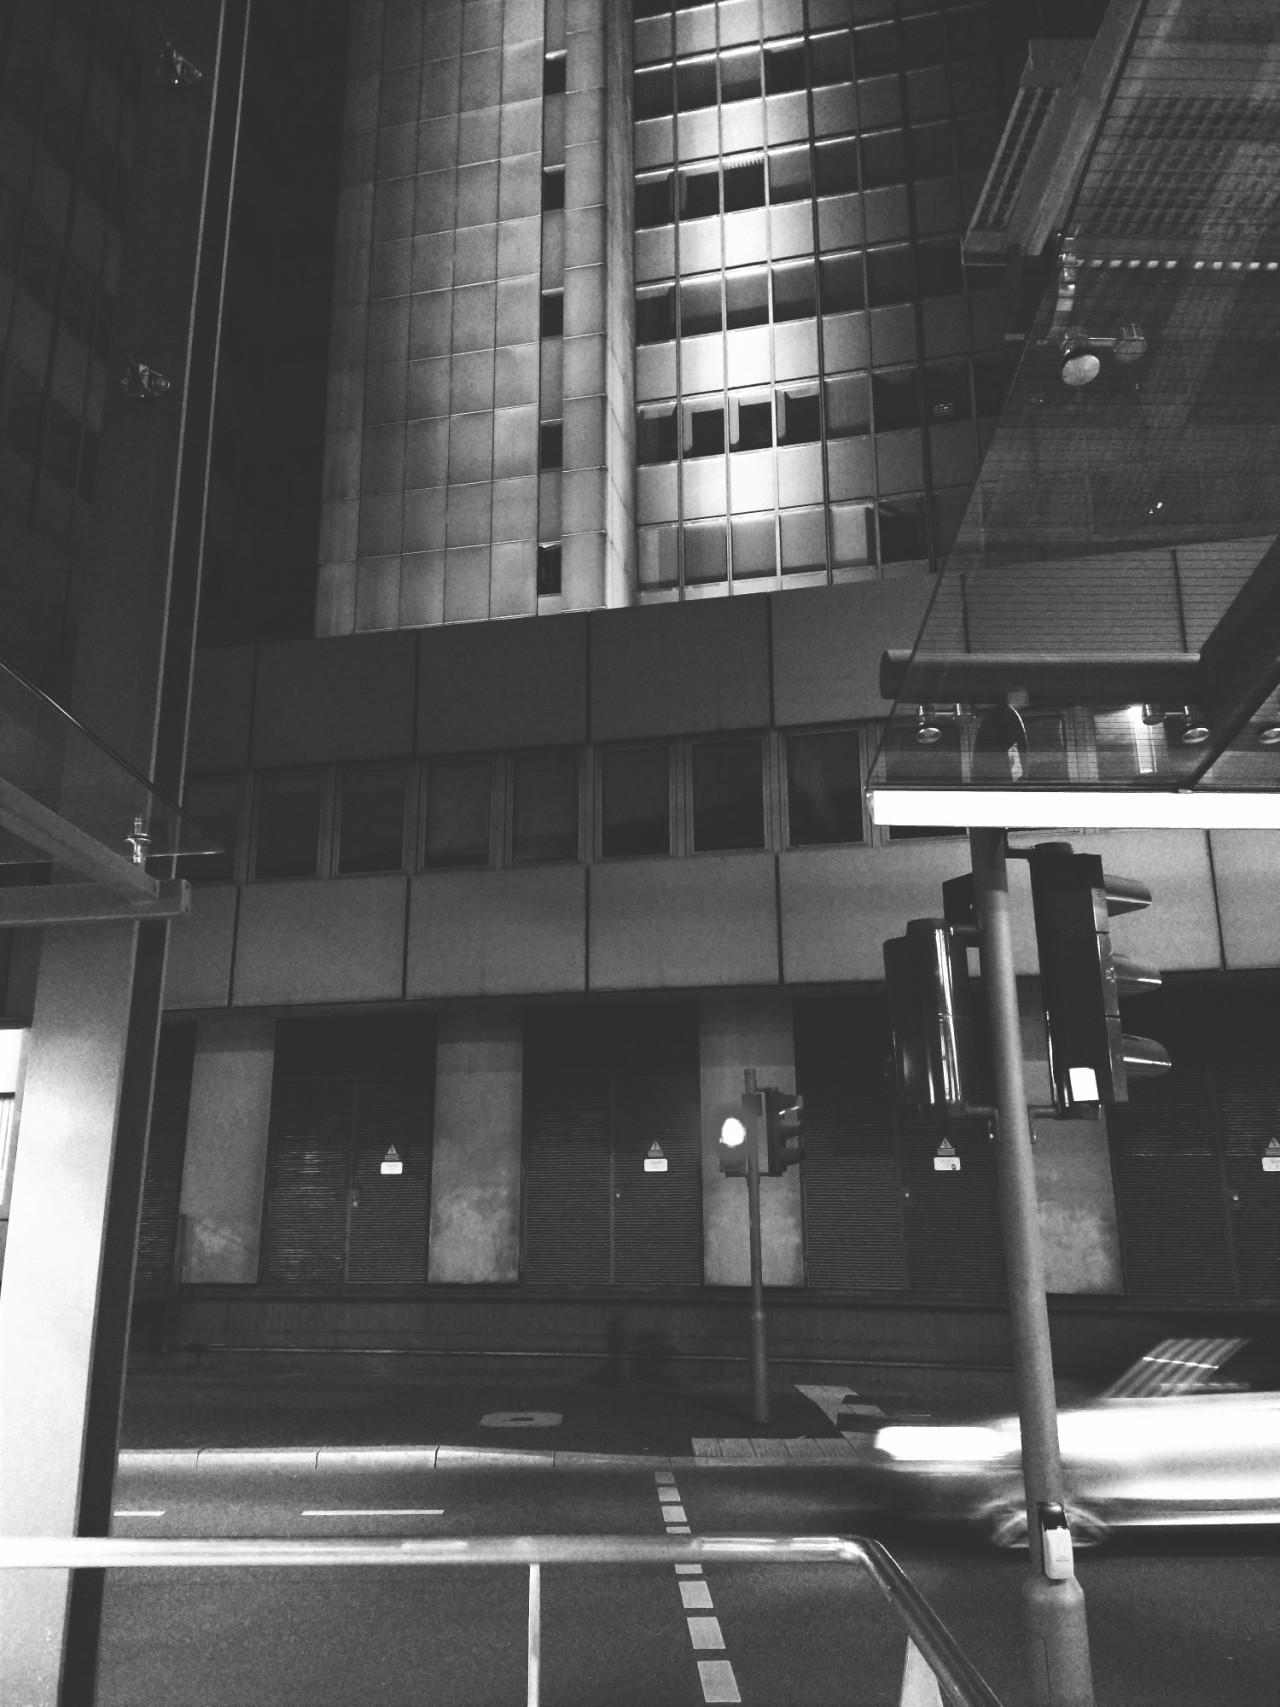 #zoom swoosh  #city #urban #citylife #night #architecture #cityhall #street #lights  #stadthaus #bonn #germany #zoom#city#urban#citylife#night#architecture#cityhall#street#lights#stadthaus#germany